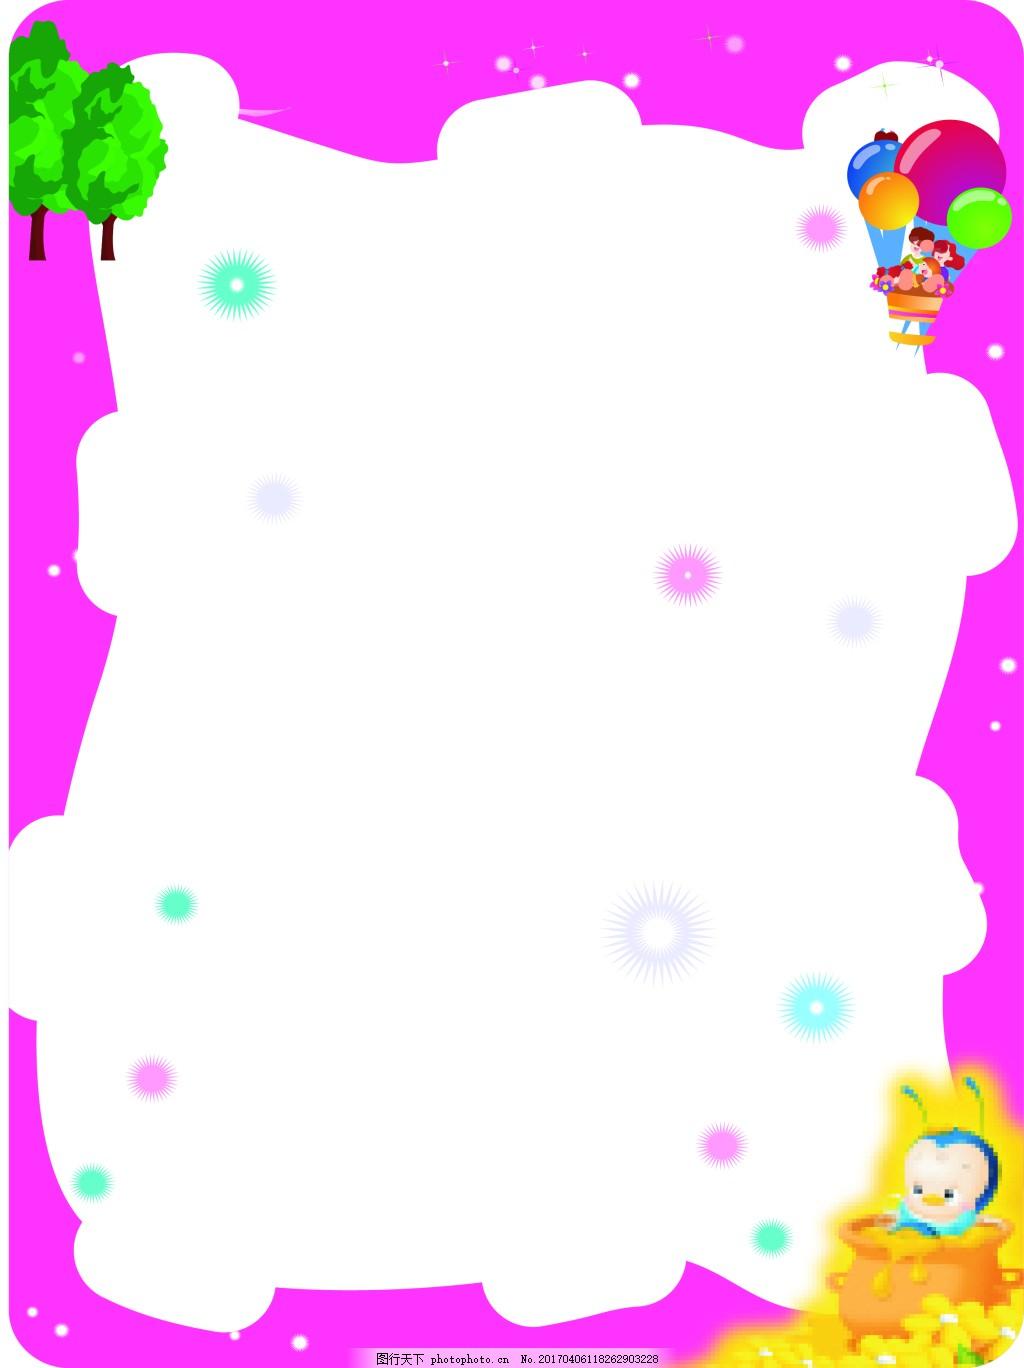 ppt 背景 背景图片 边框 模板 设计 相框 1024_1368 竖版 竖屏